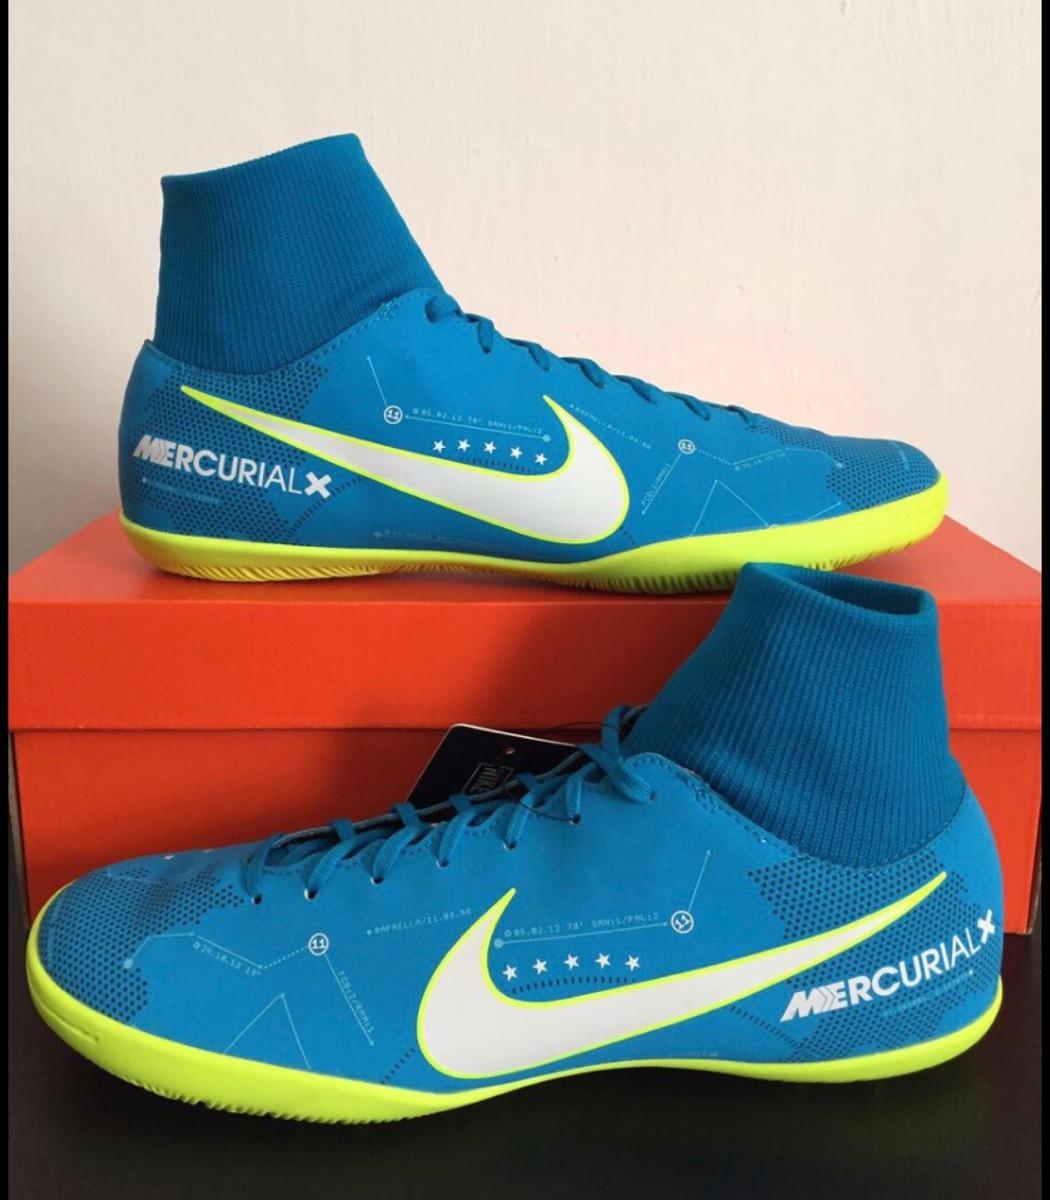 Tenis Nike Mercurial Neymar  8  8.5 Mx (remate) -   996.00 en ... 85fb94b6a936c